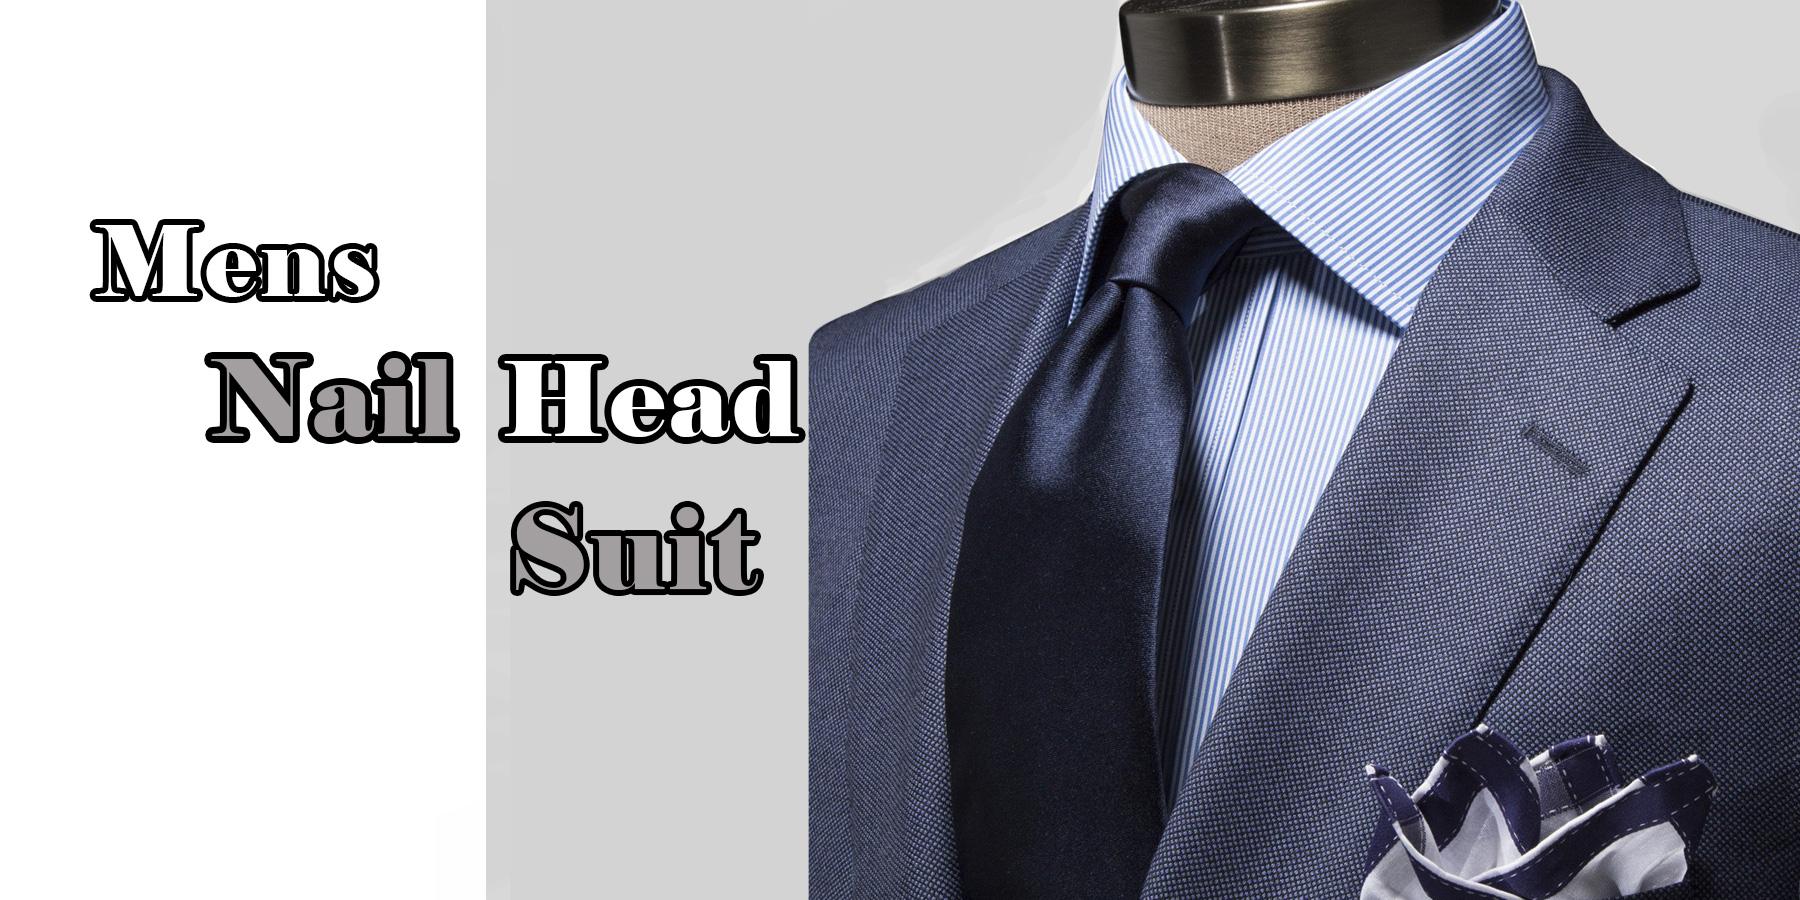 Nailhead-Suit